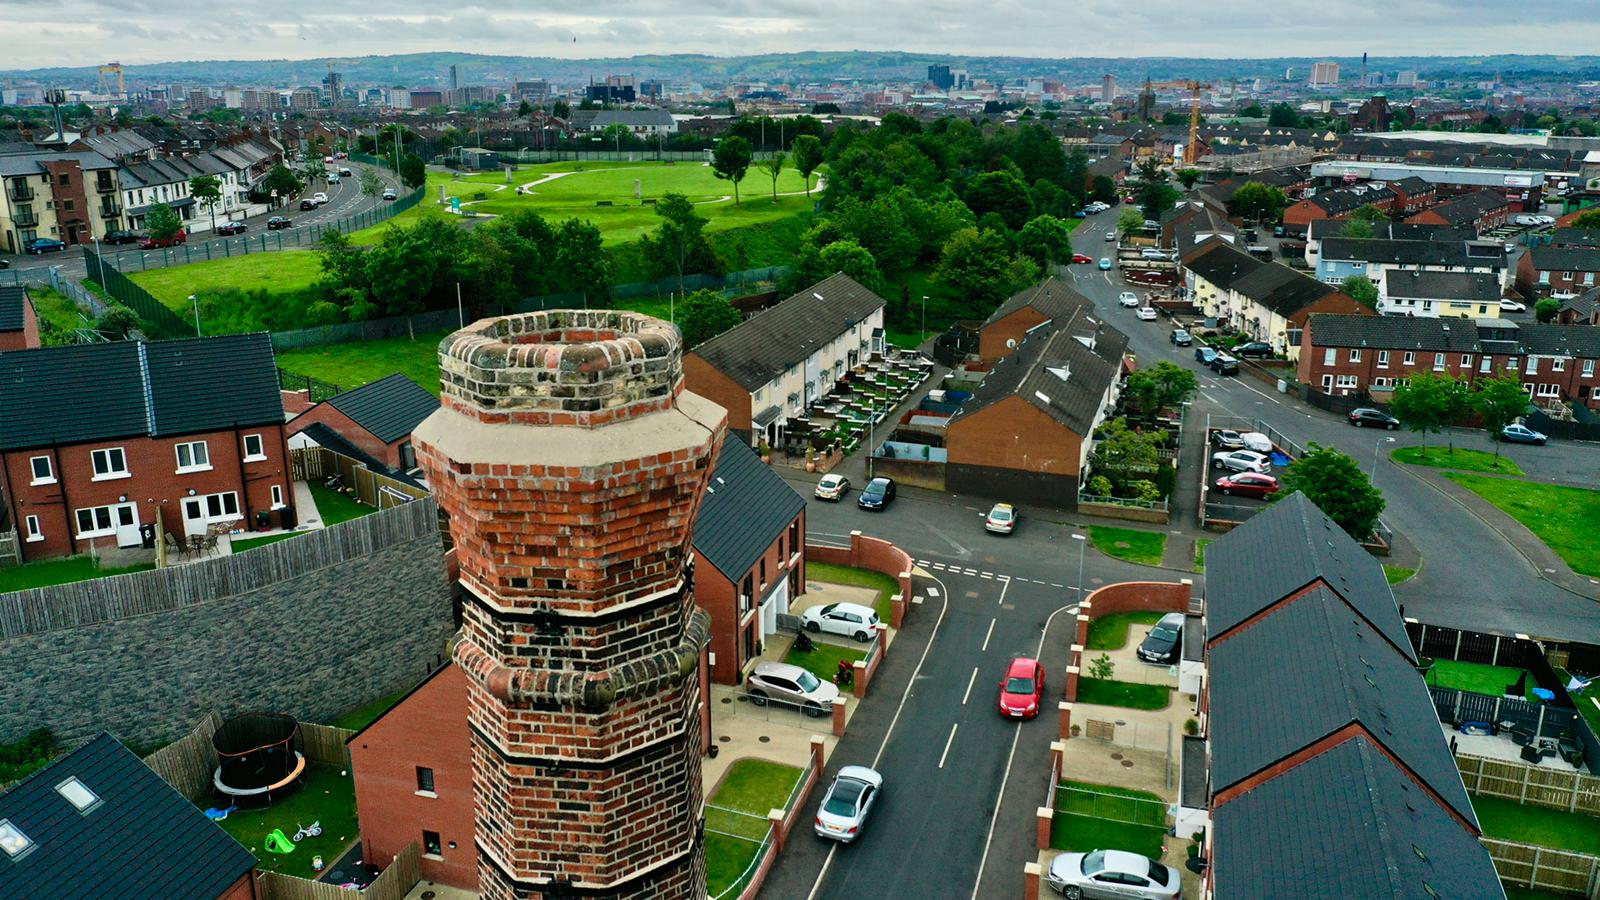 NORTH CHOICE: Belmore Way new housing development in North Belfast.